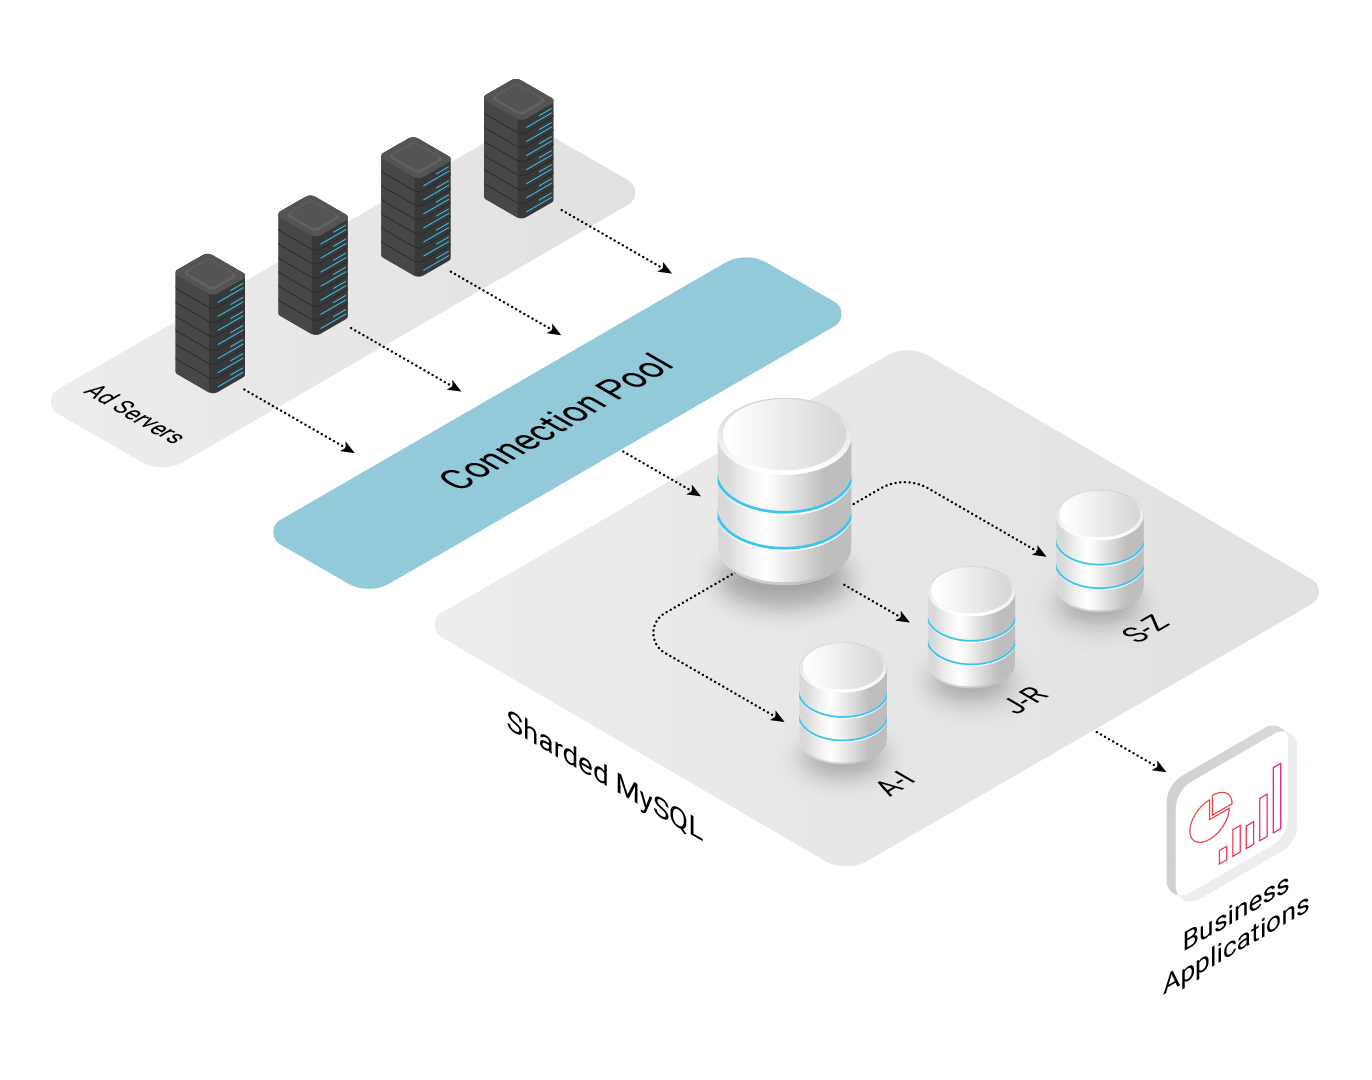 MobFox's Previous Analytics Architecture